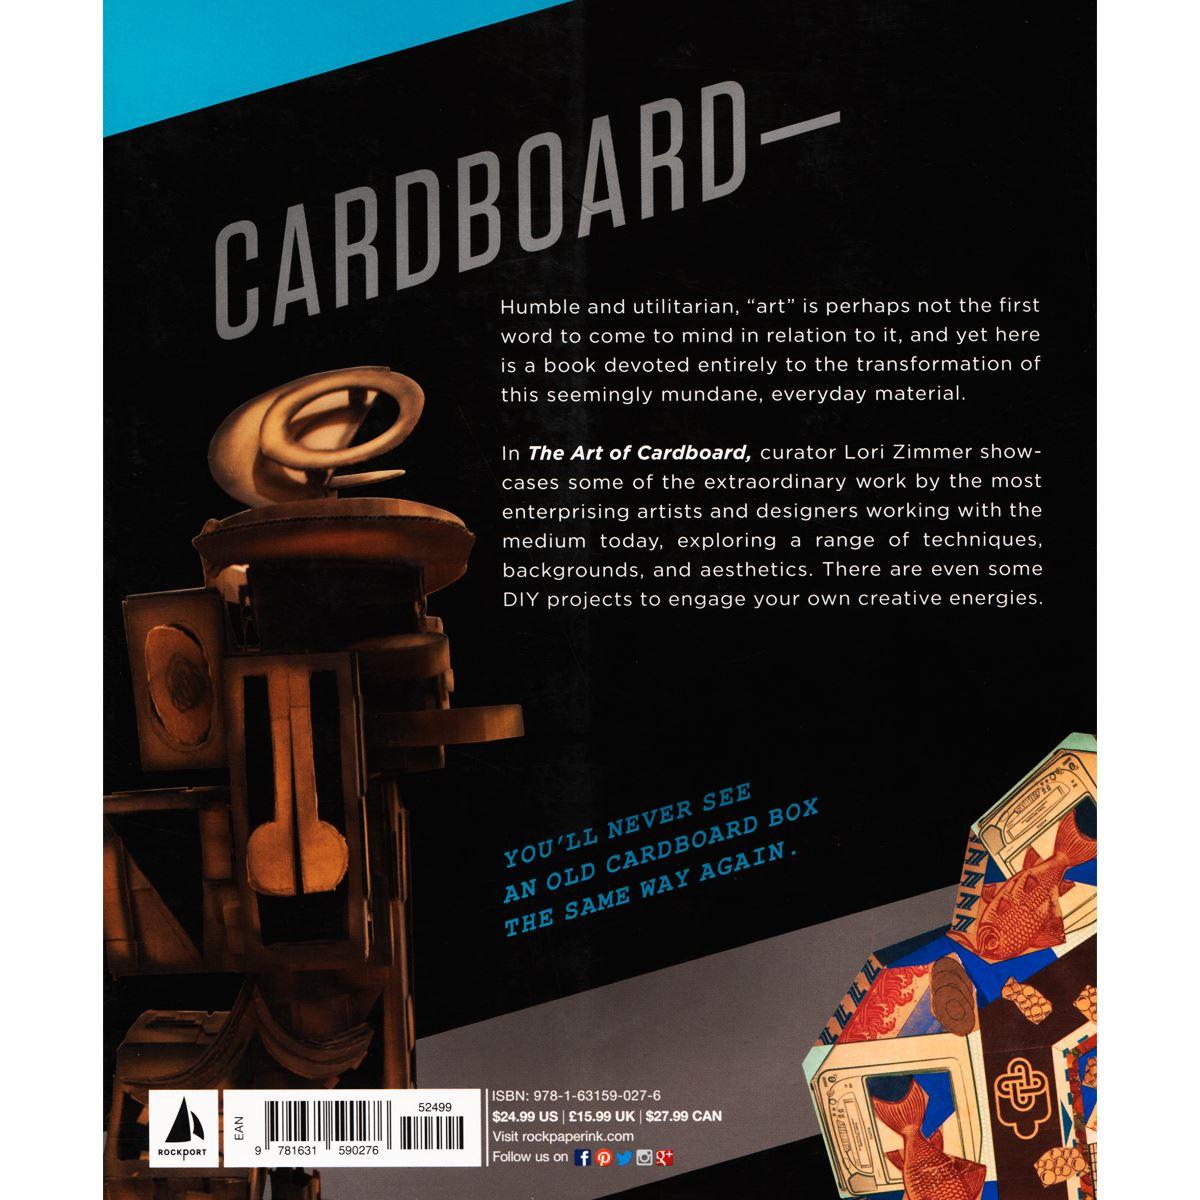 The Art of Cardboard